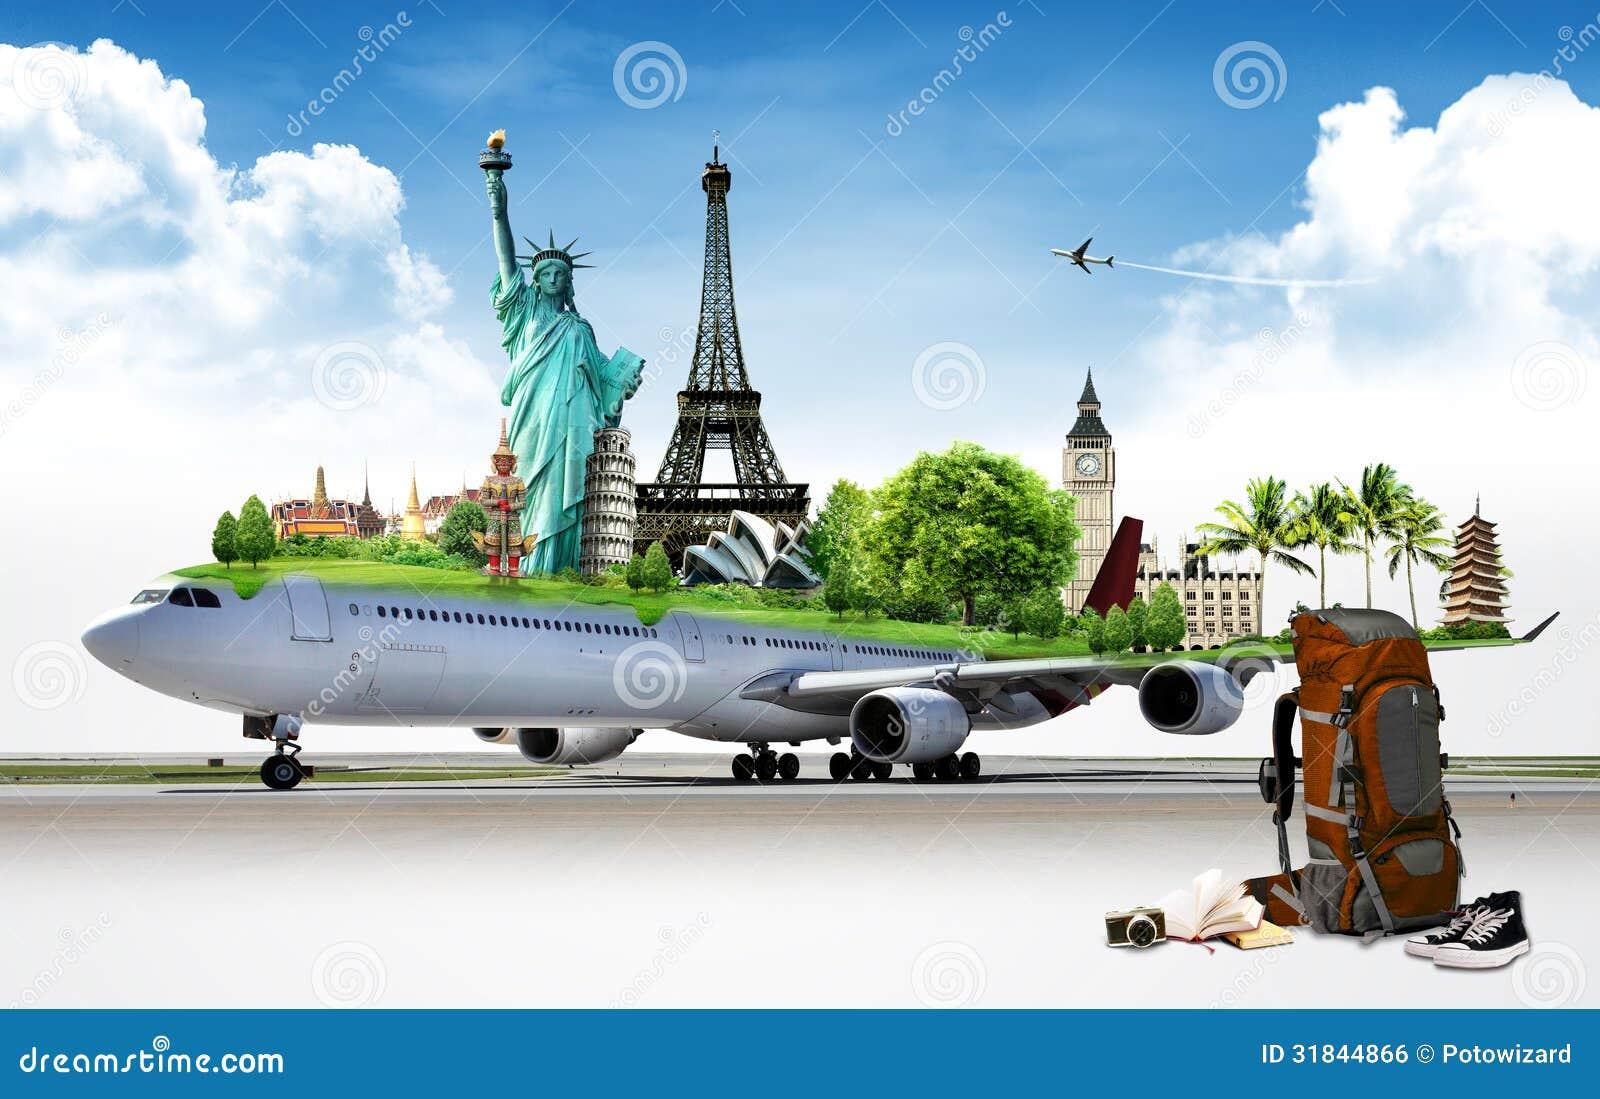 Viaja o mundo